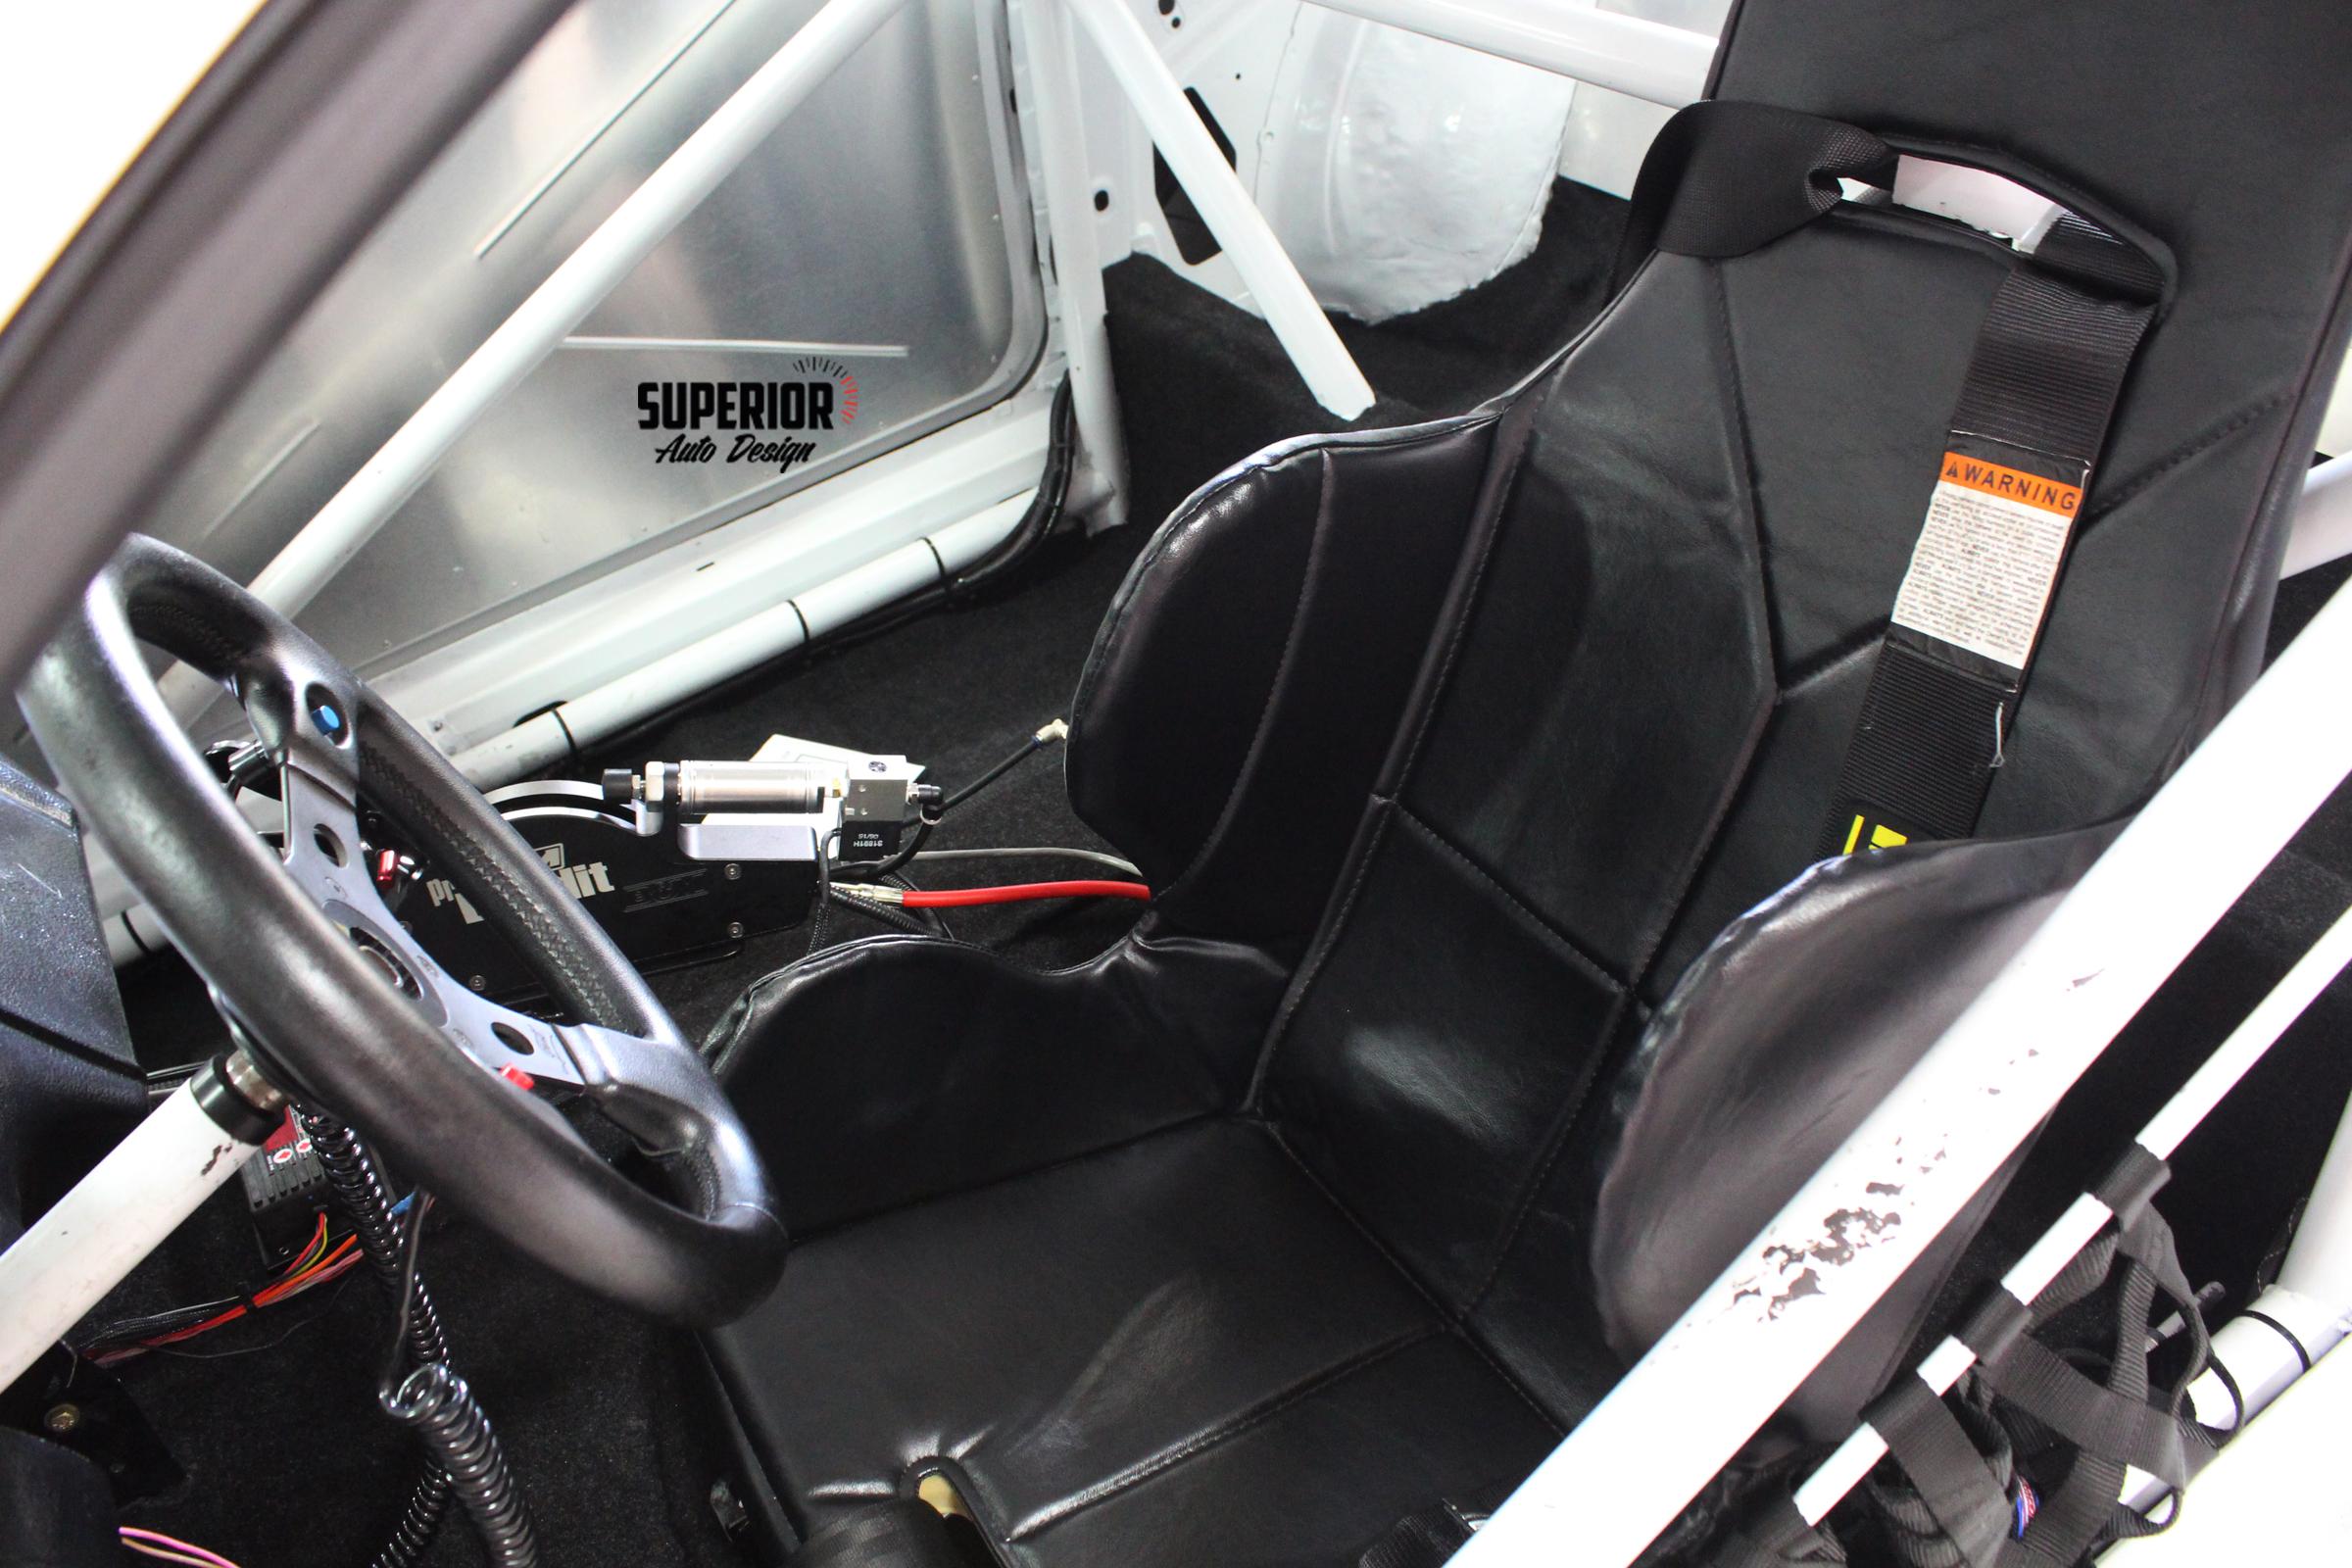 MUSTANG RACE CAR TWIN TURBO CARPET SUPERIOR AUTO DESIGN 9